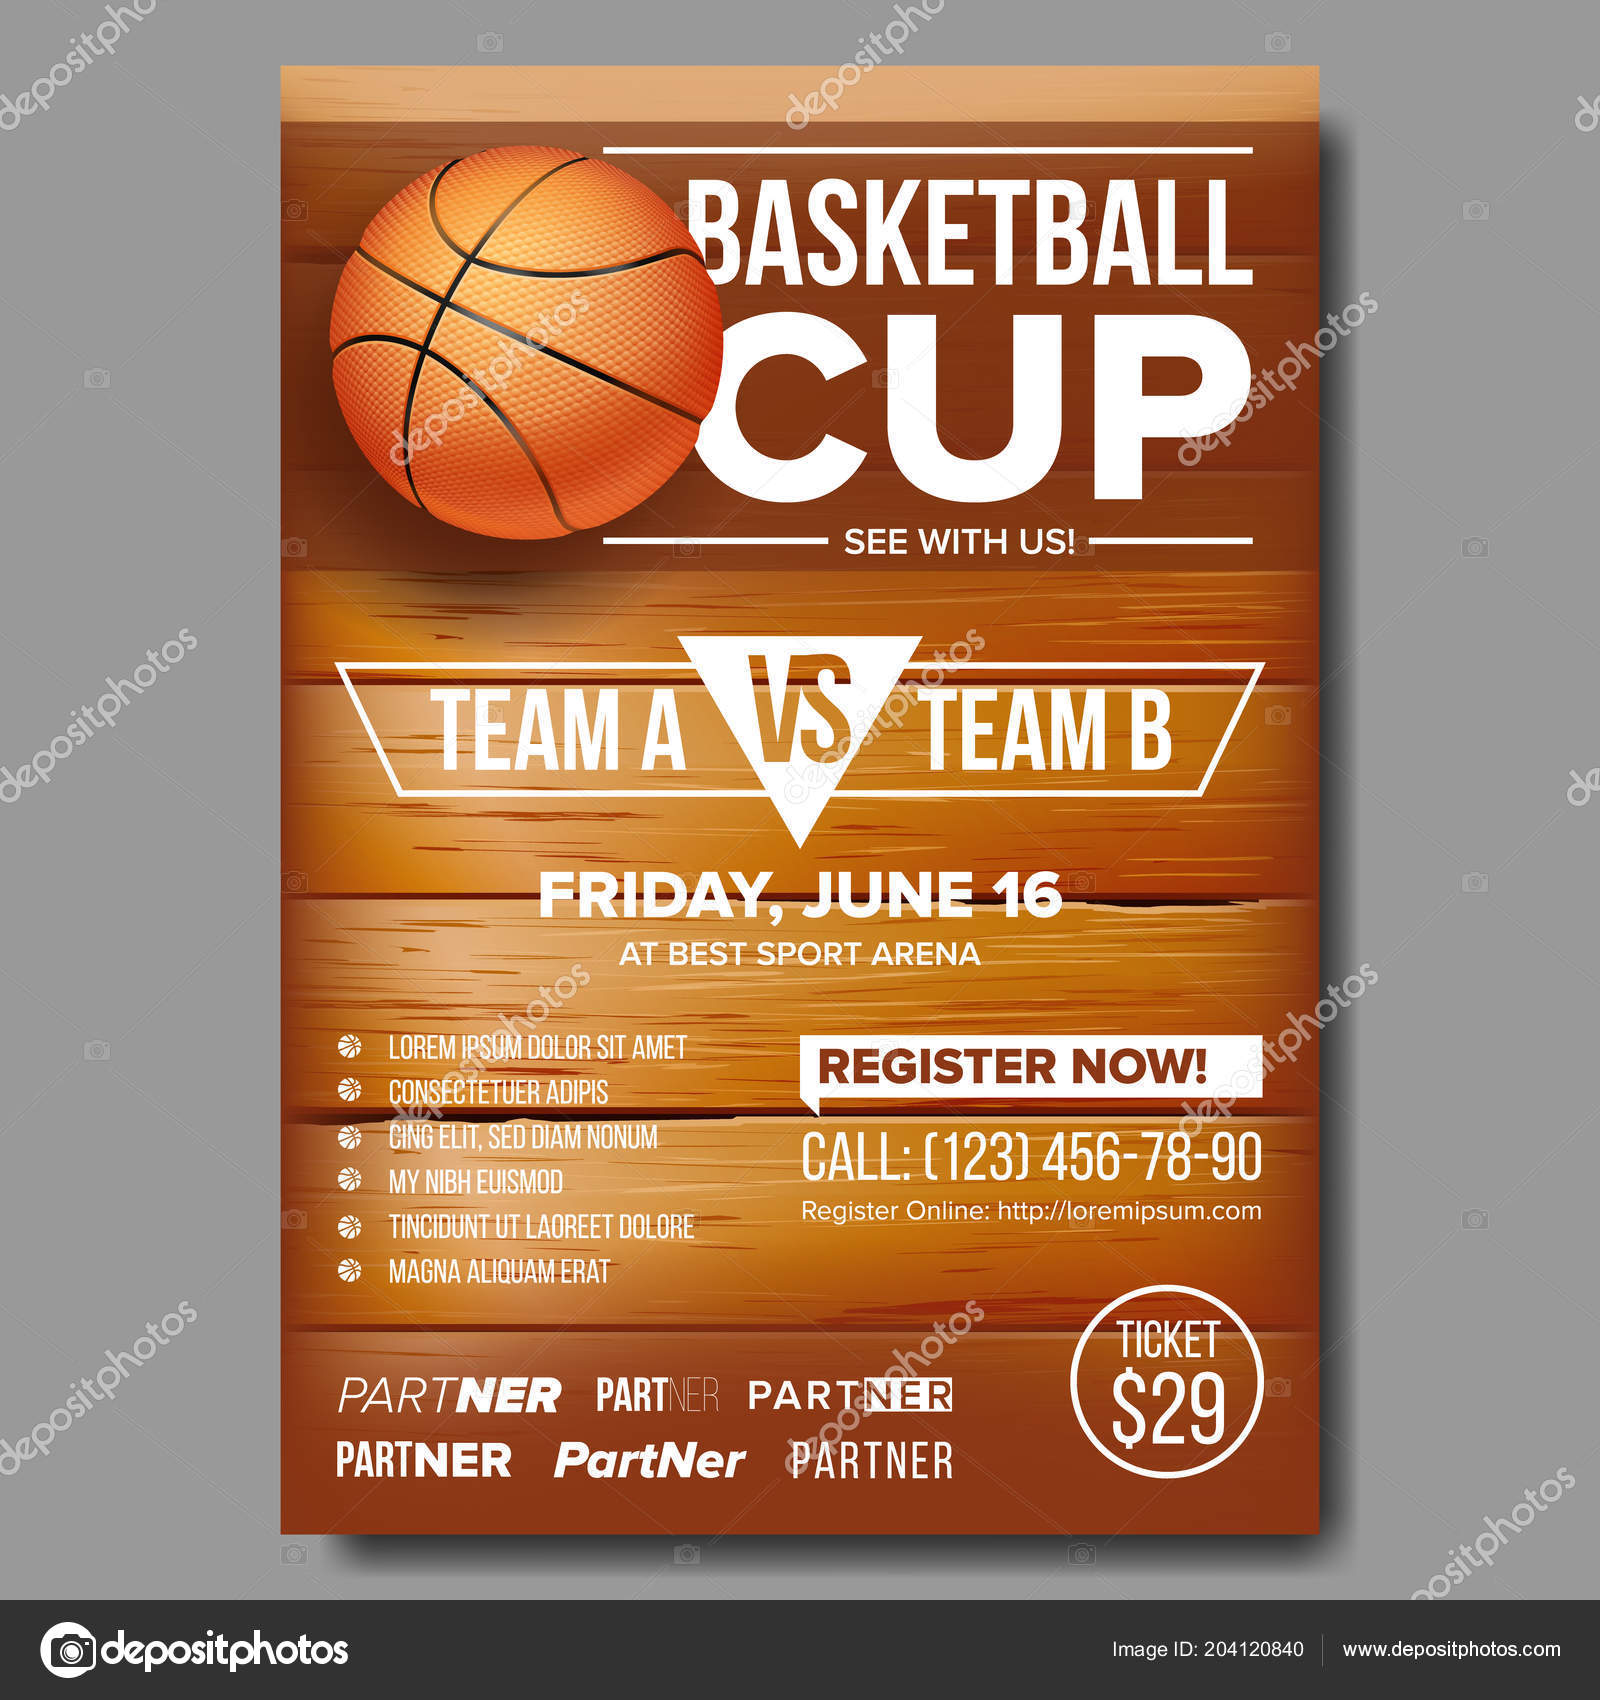 design for sports bar promotion basketball ball tournament sport event announcement banner advertising game flyer leaflet template illustration